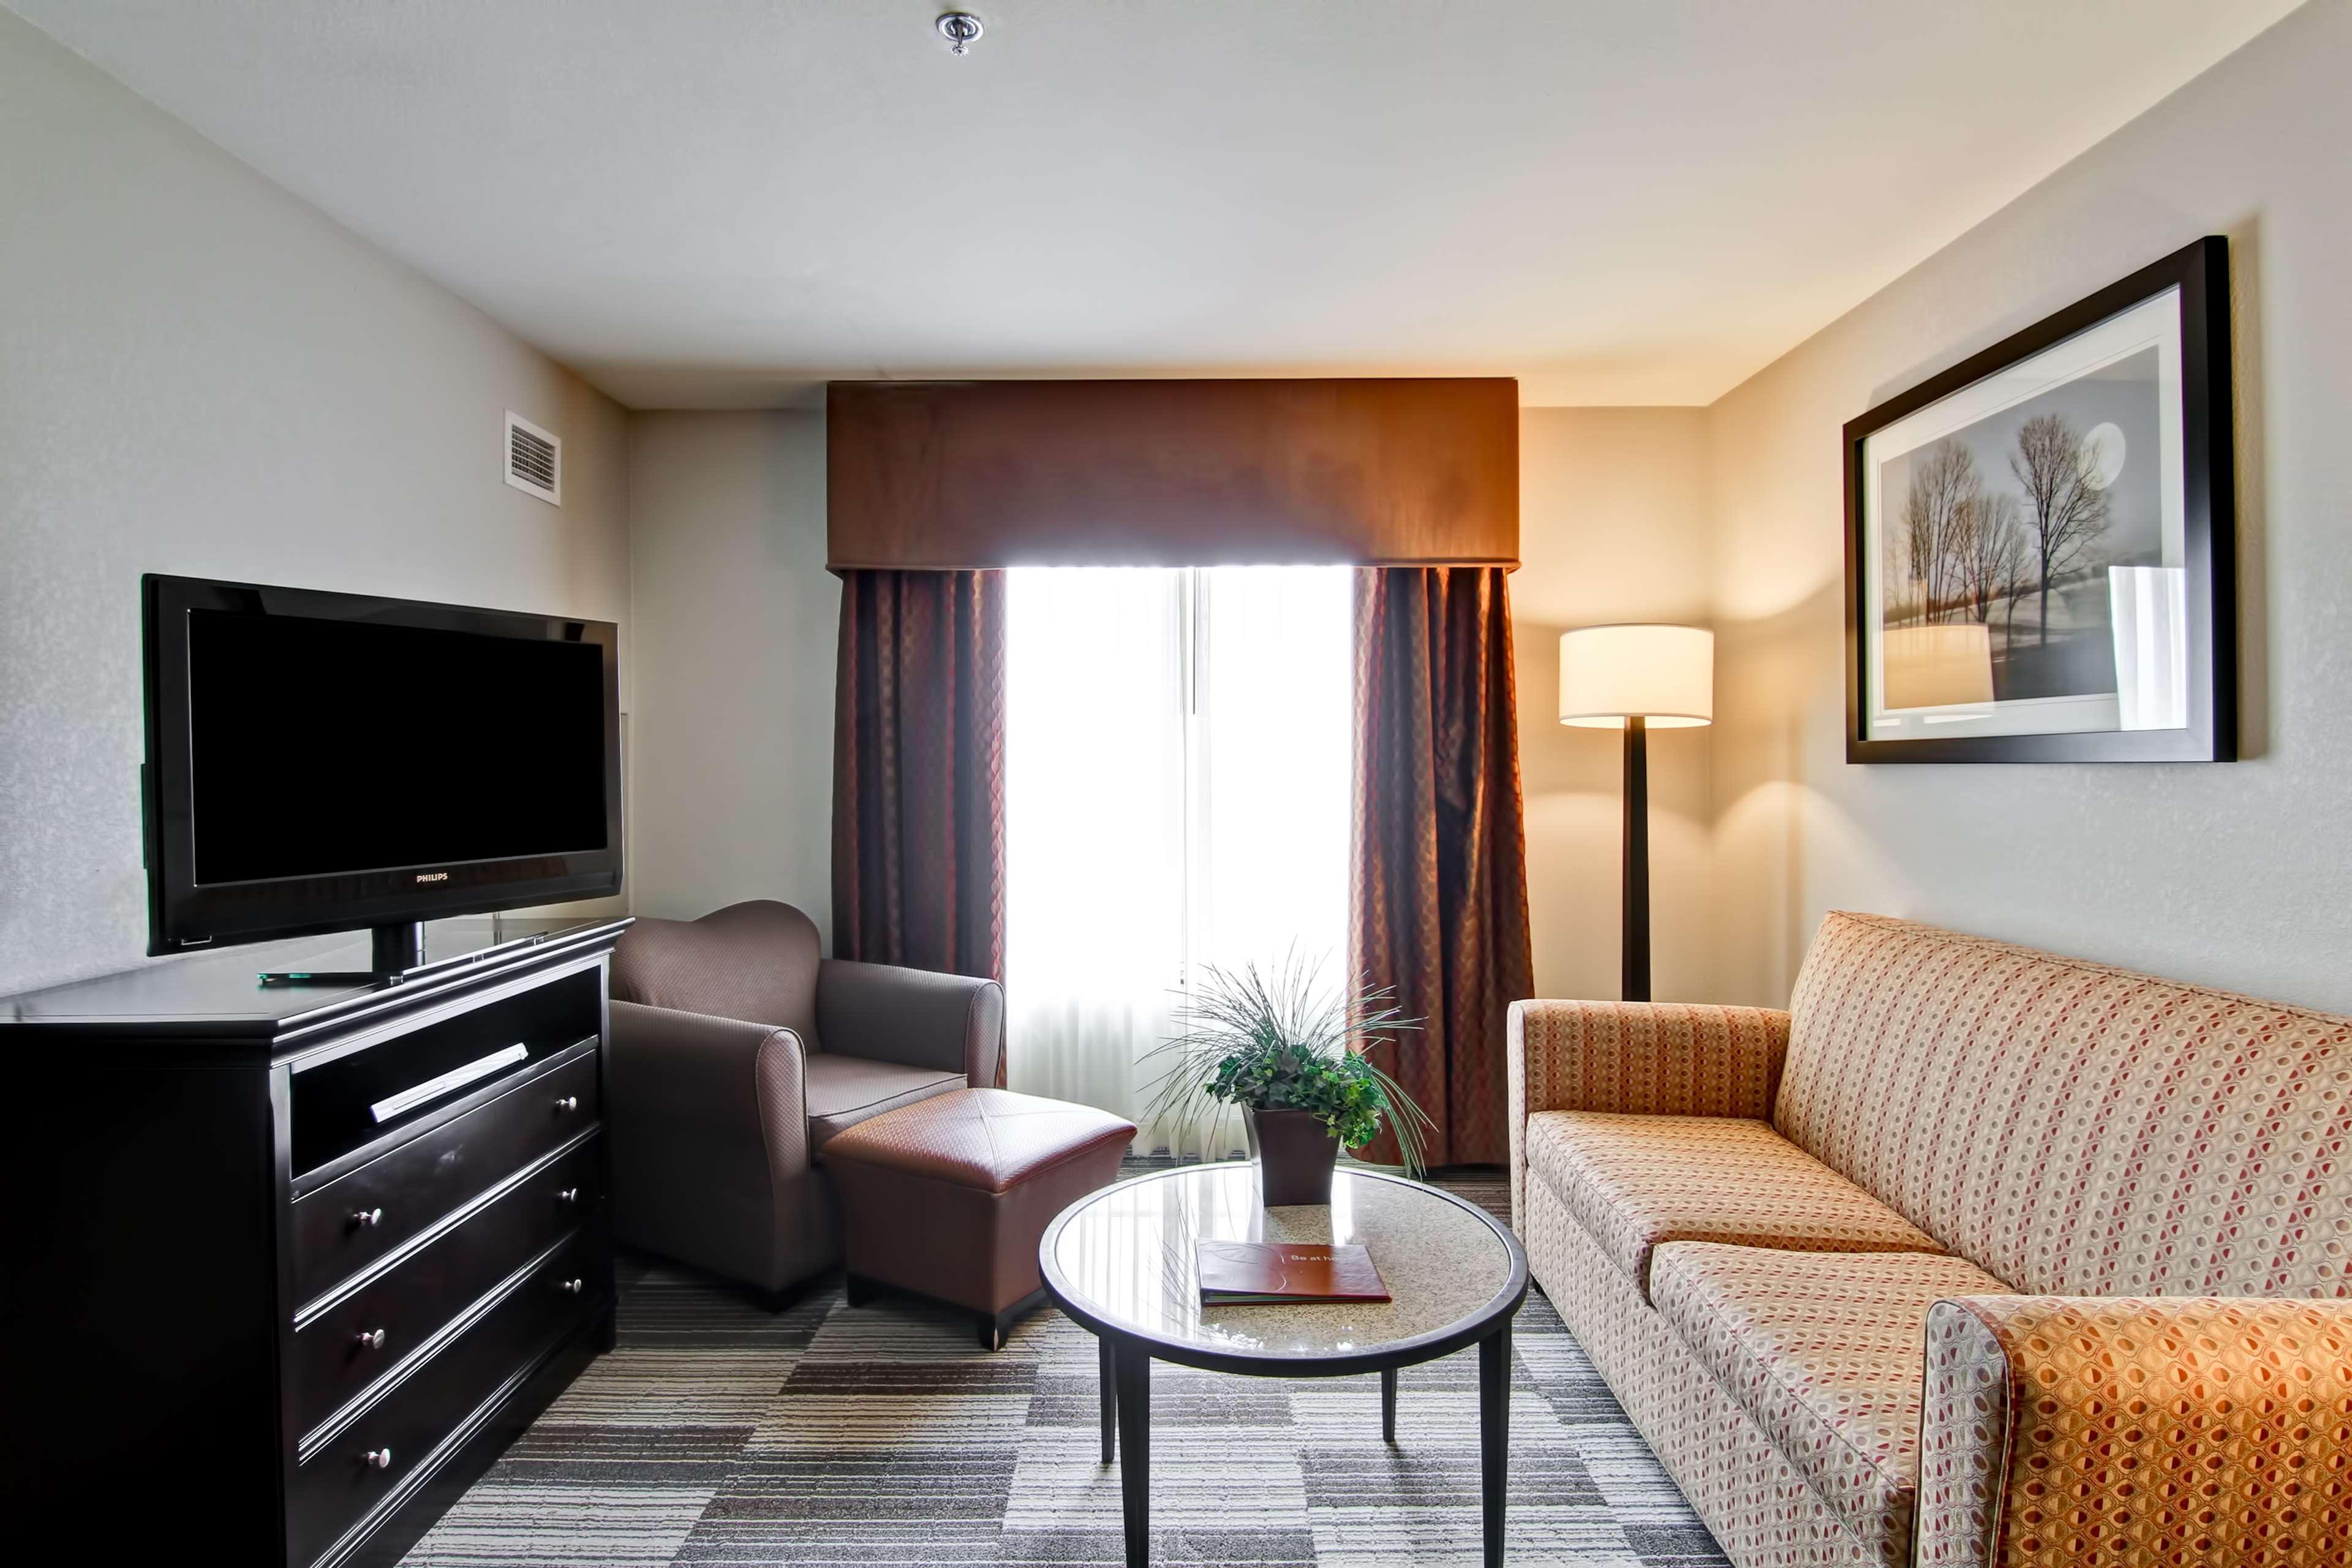 Homewood Suites by Hilton Cincinnati Airport South-Florence image 20